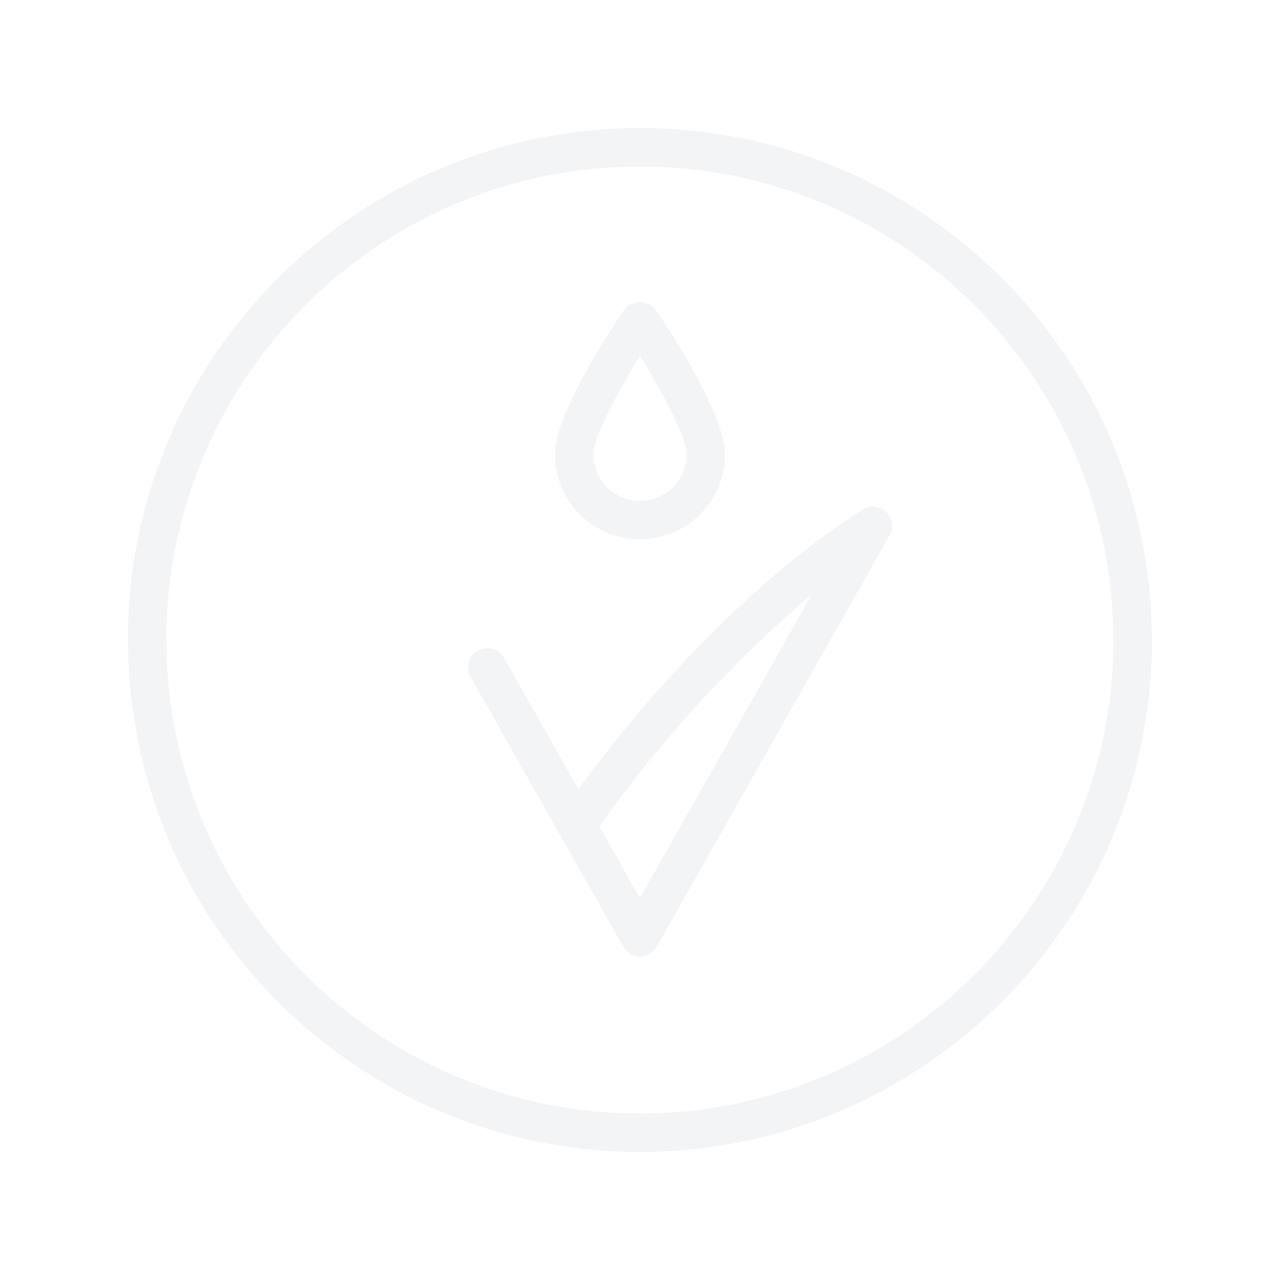 HOLIKA HOLIKA Wonder Drawing Skinny Eyebrow Pencil No.01 Gray Black 5ml